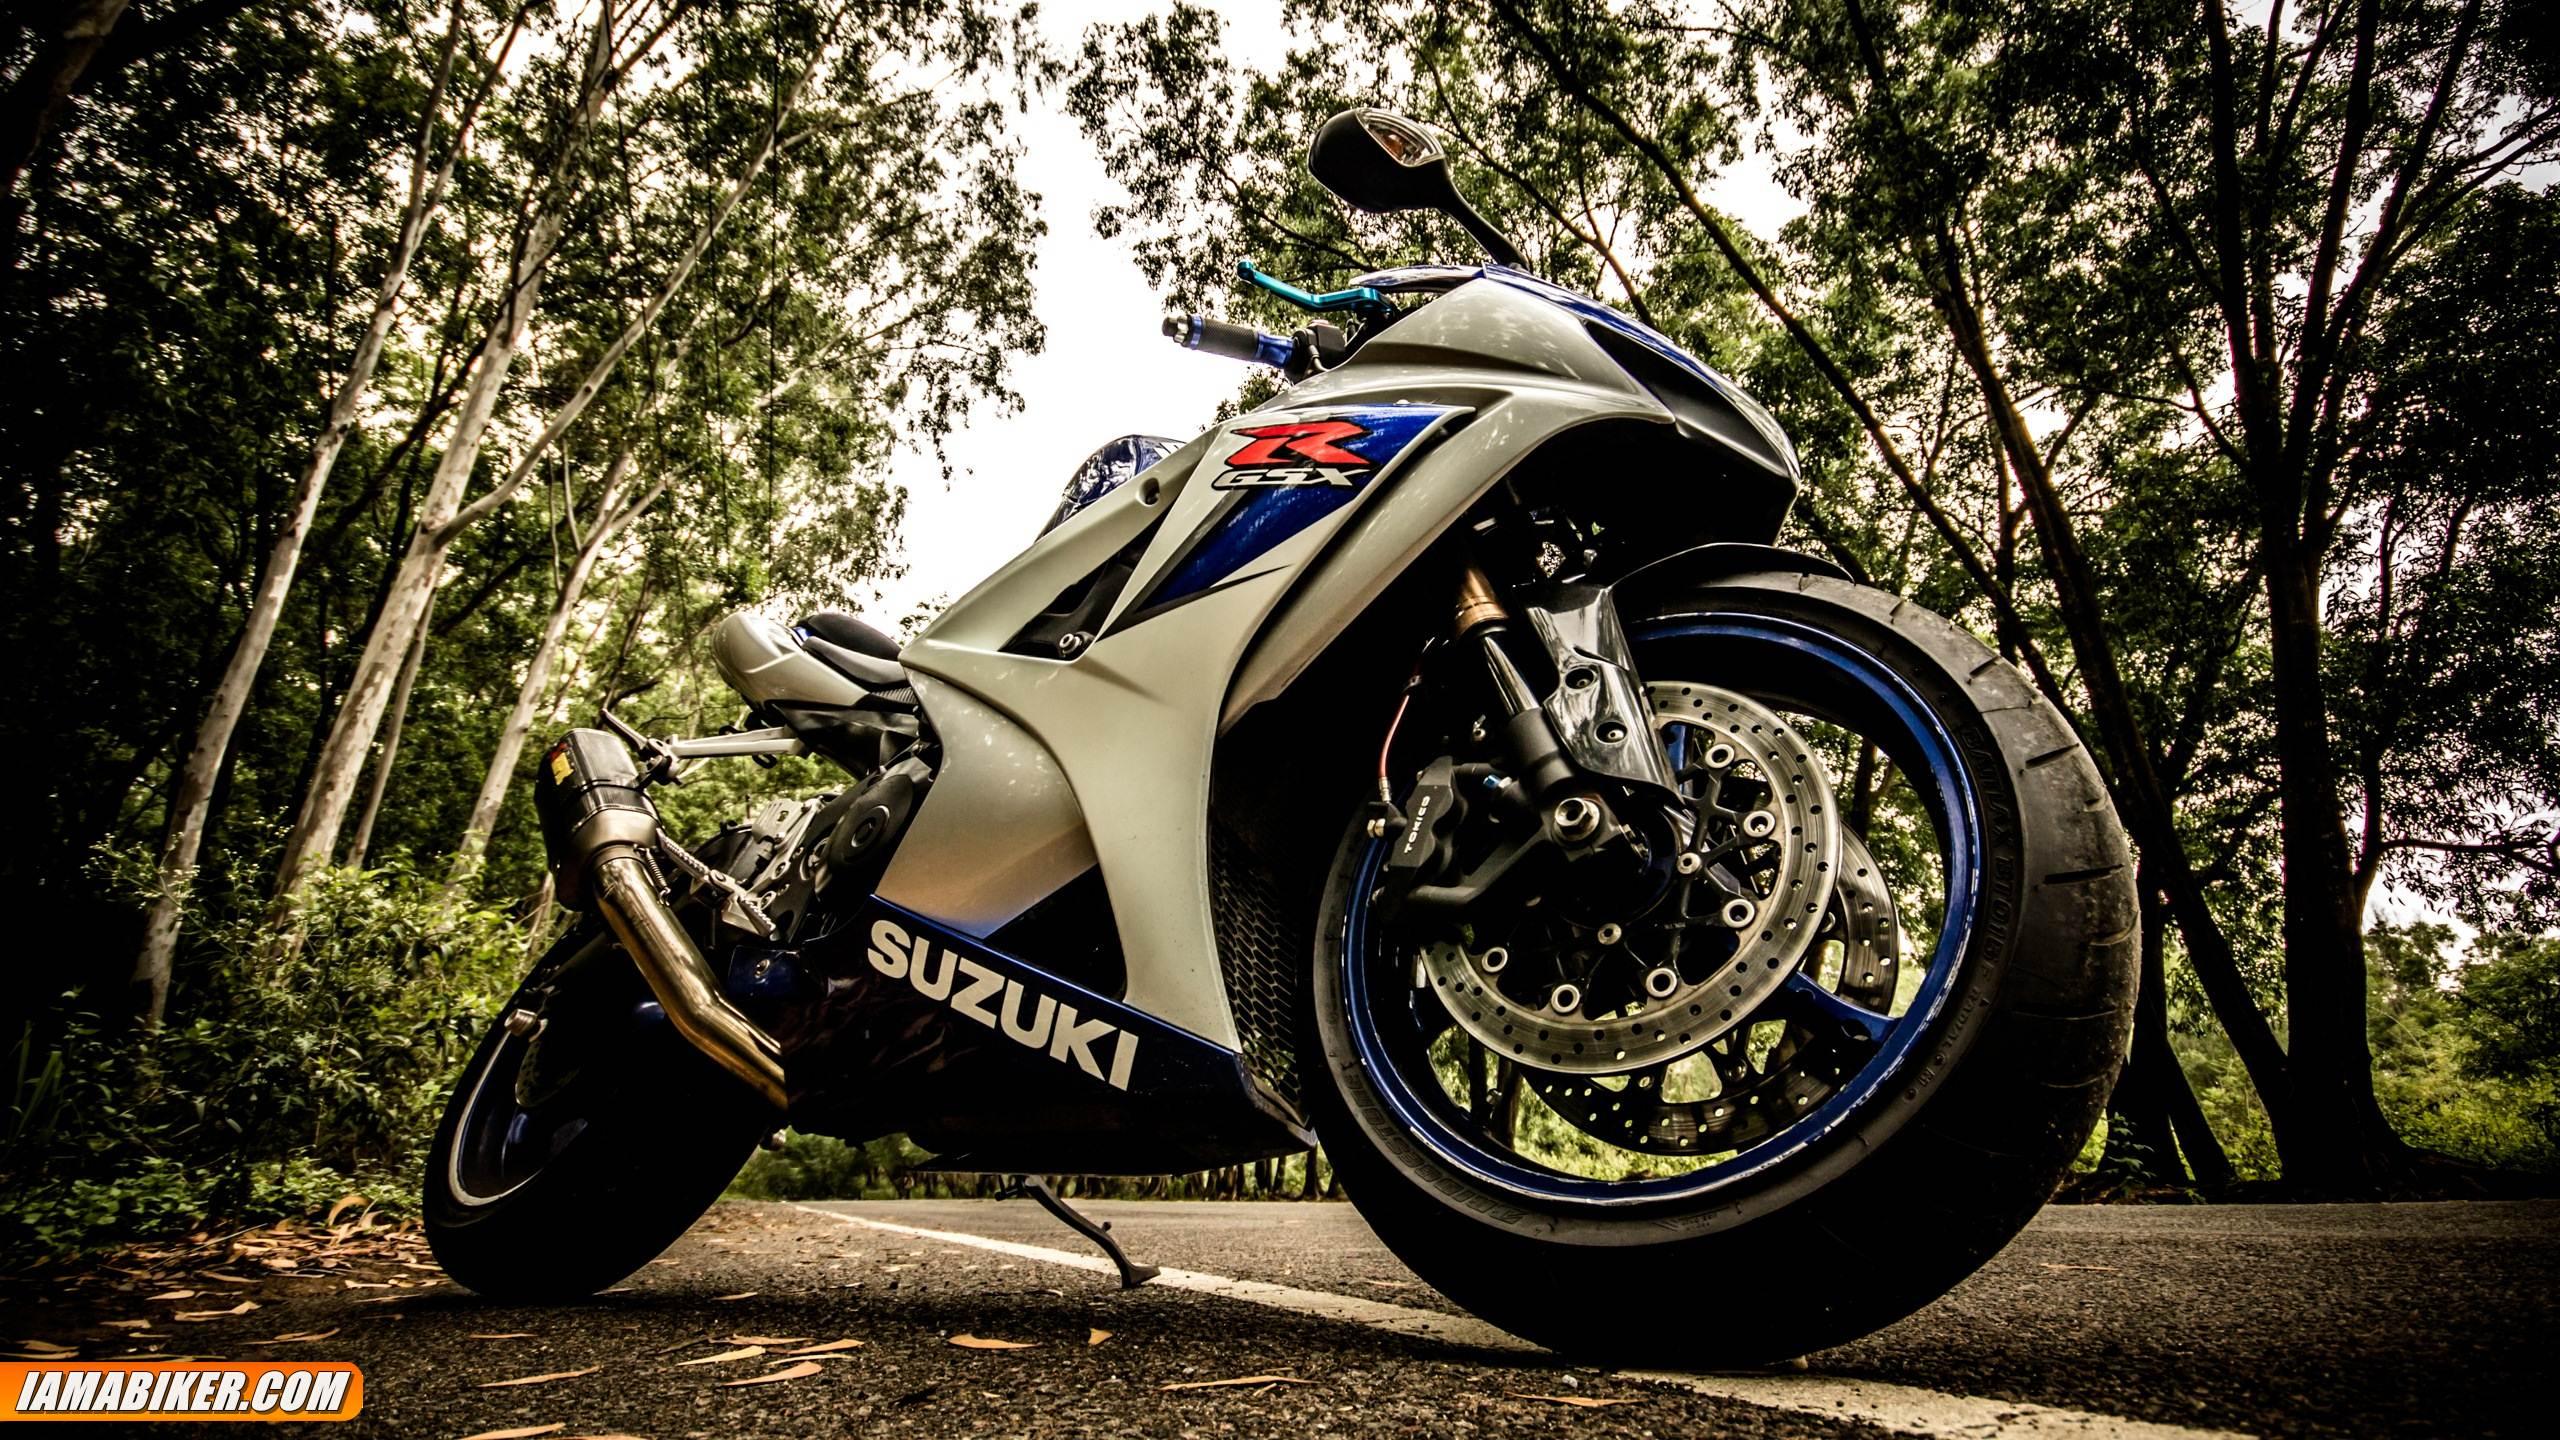 Suzuki moto  № 1582188 загрузить